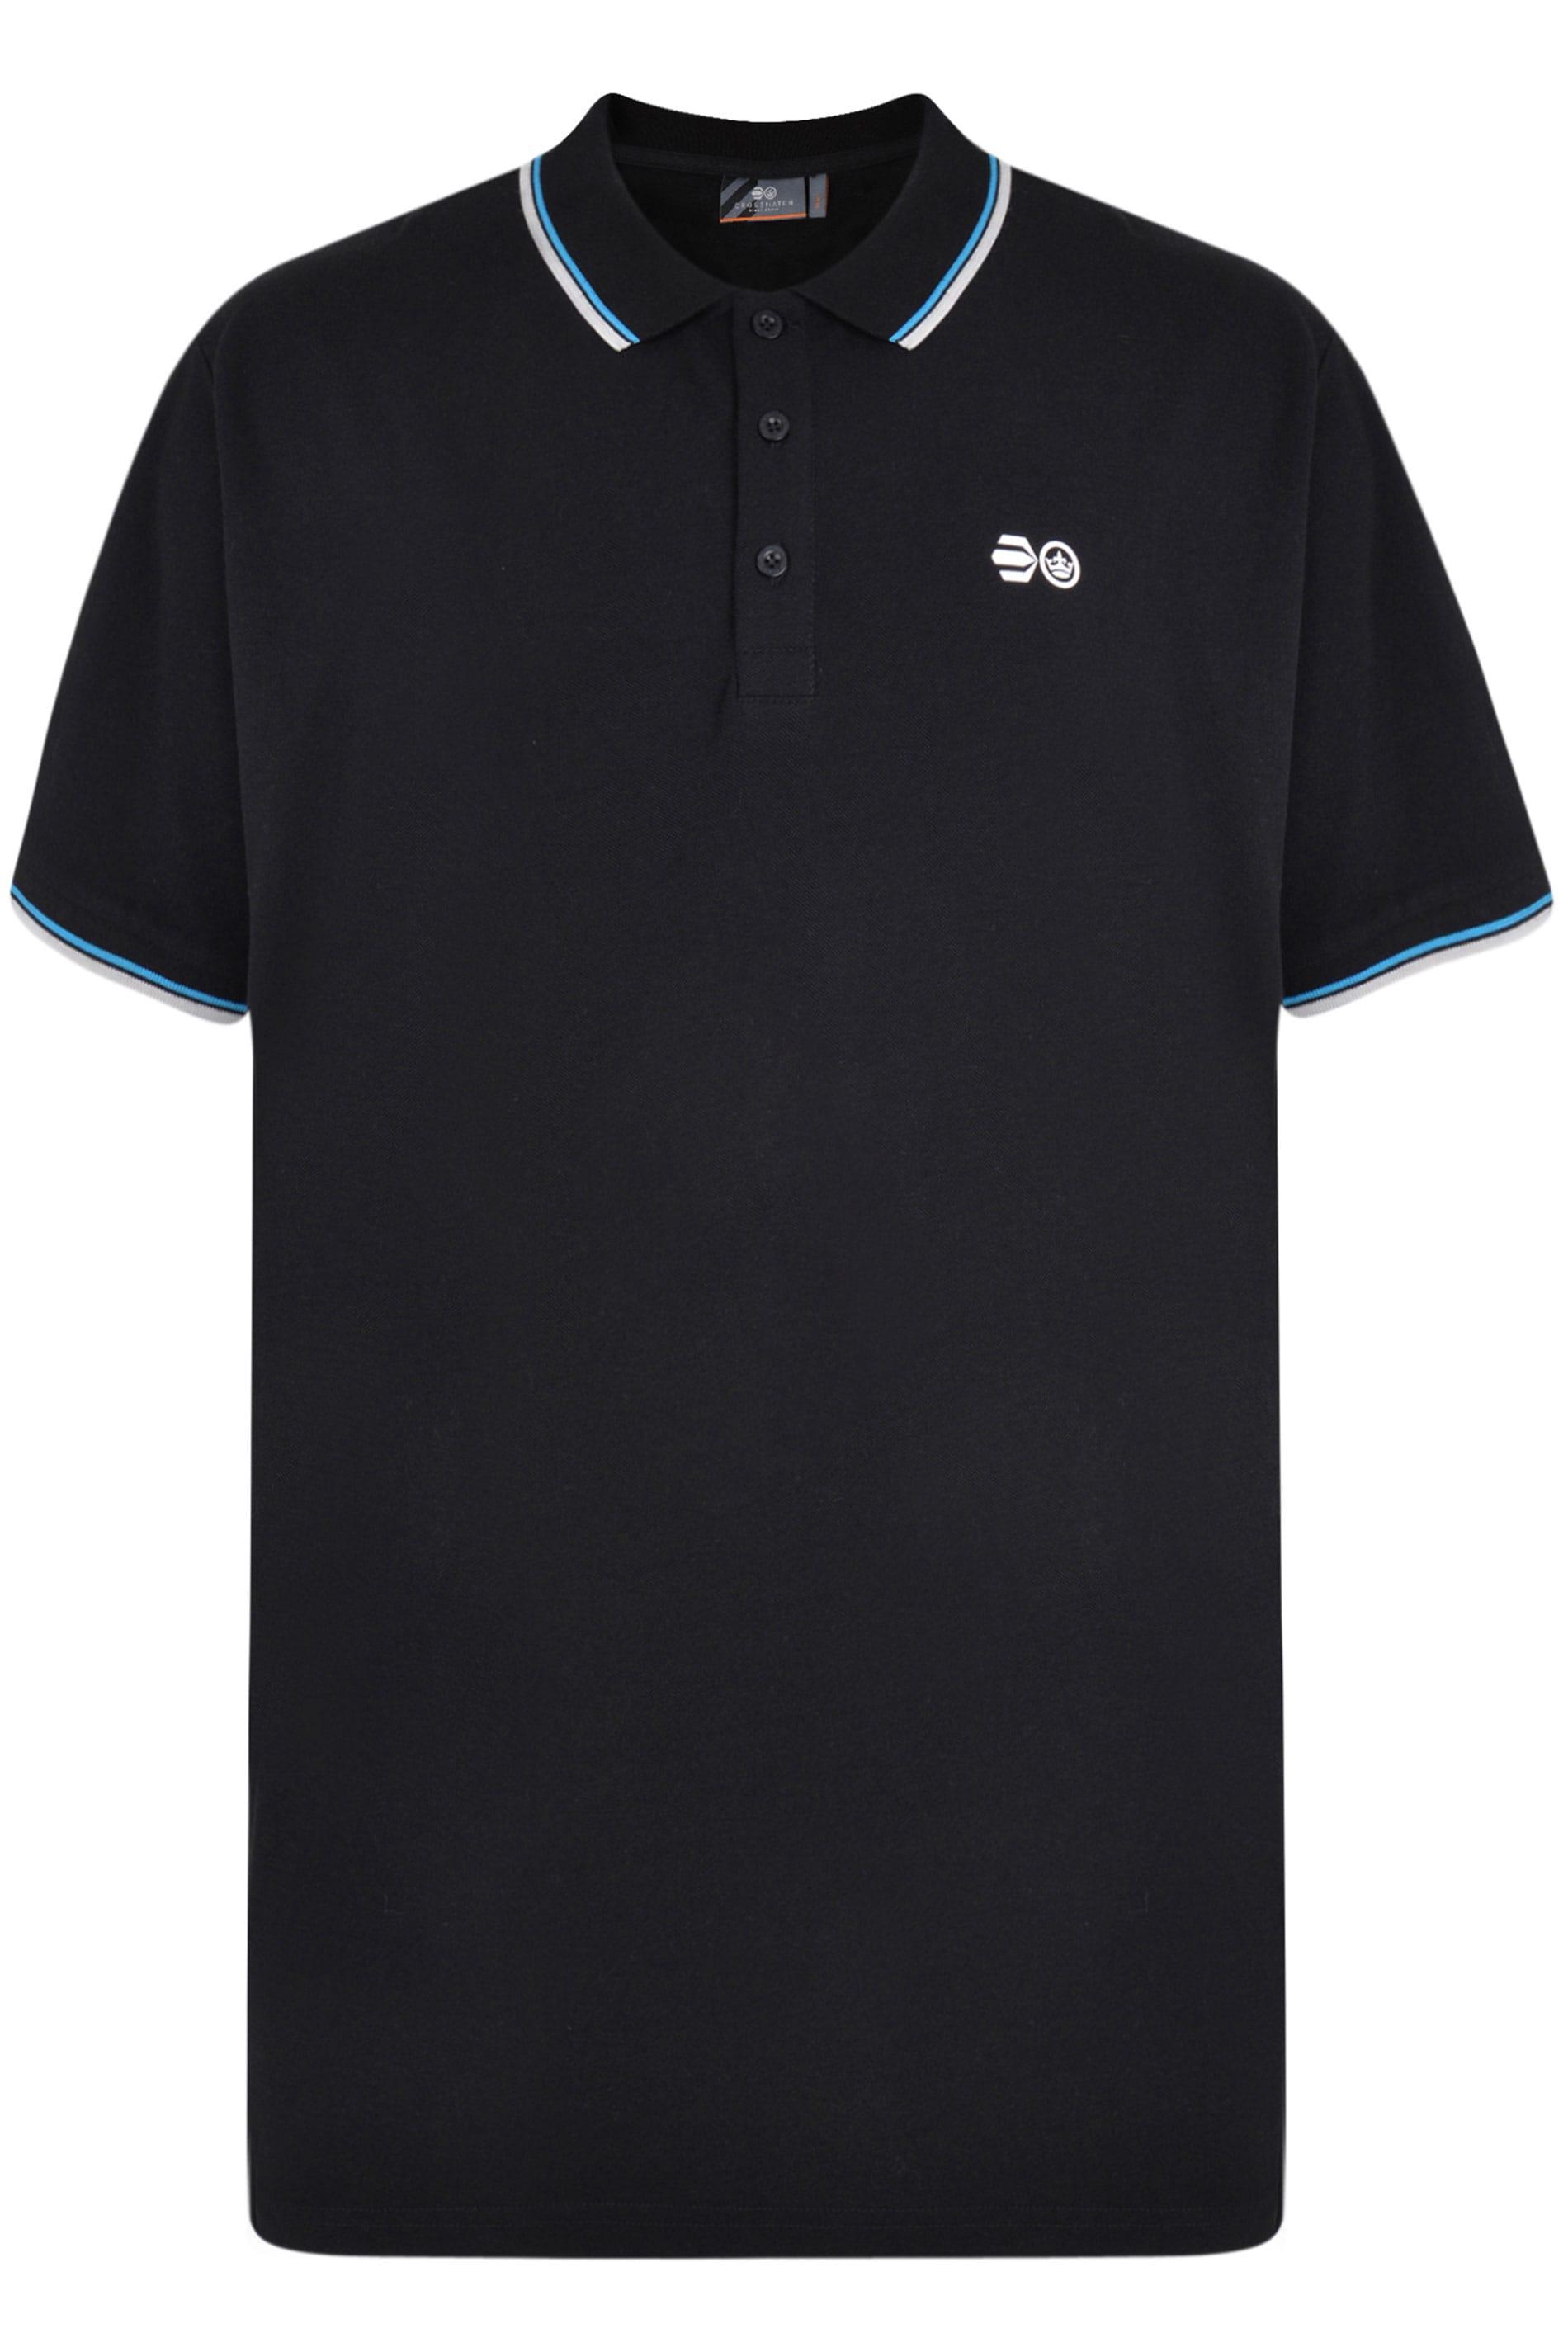 Crosshatch Black Tipped Polo Shirt